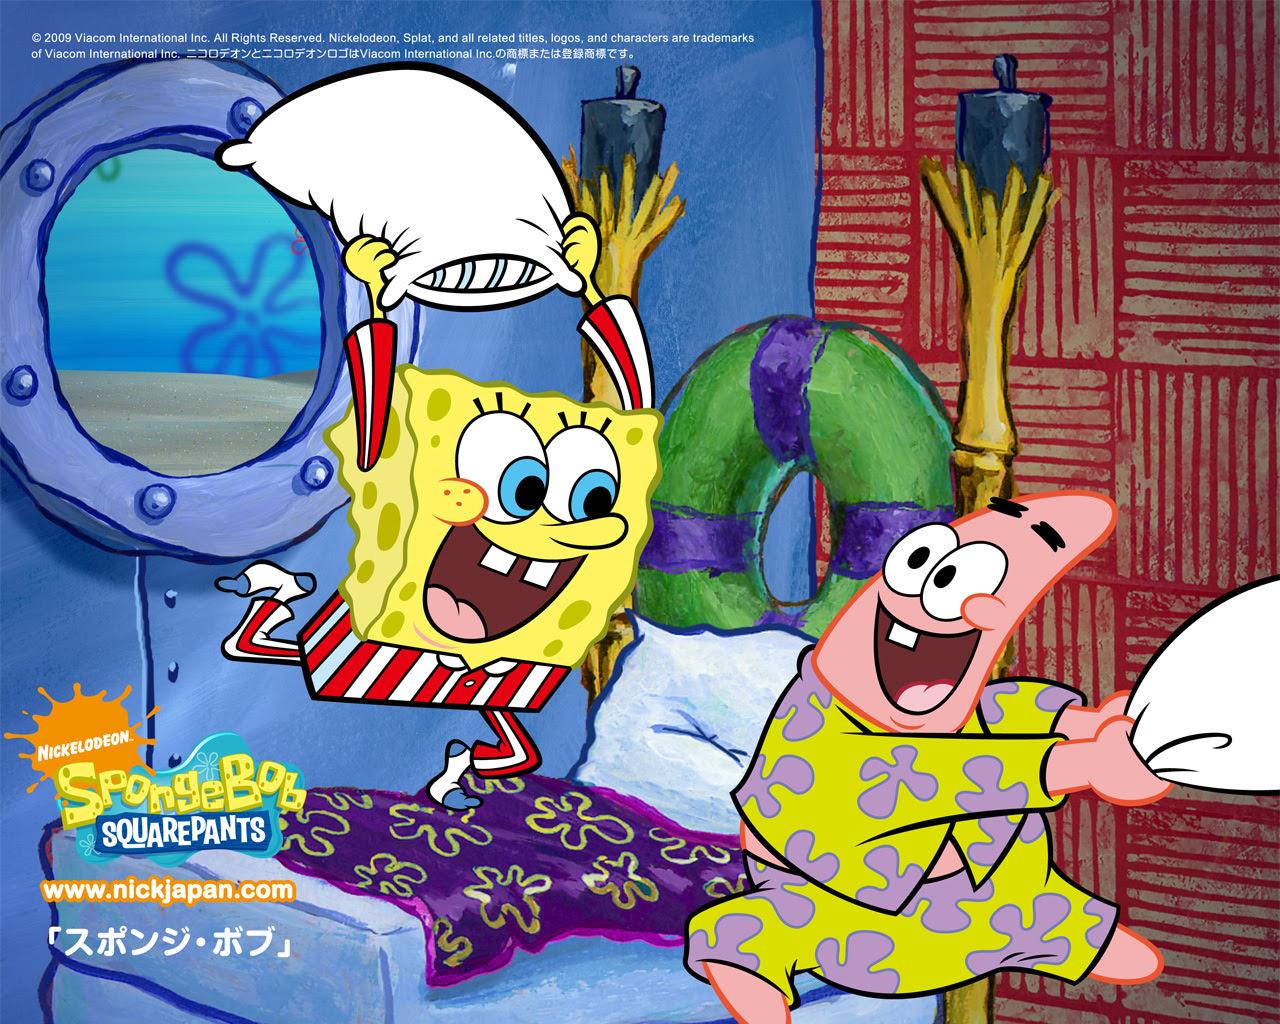 Spongebob Squarepants Pillow Fight Wallpapers Image